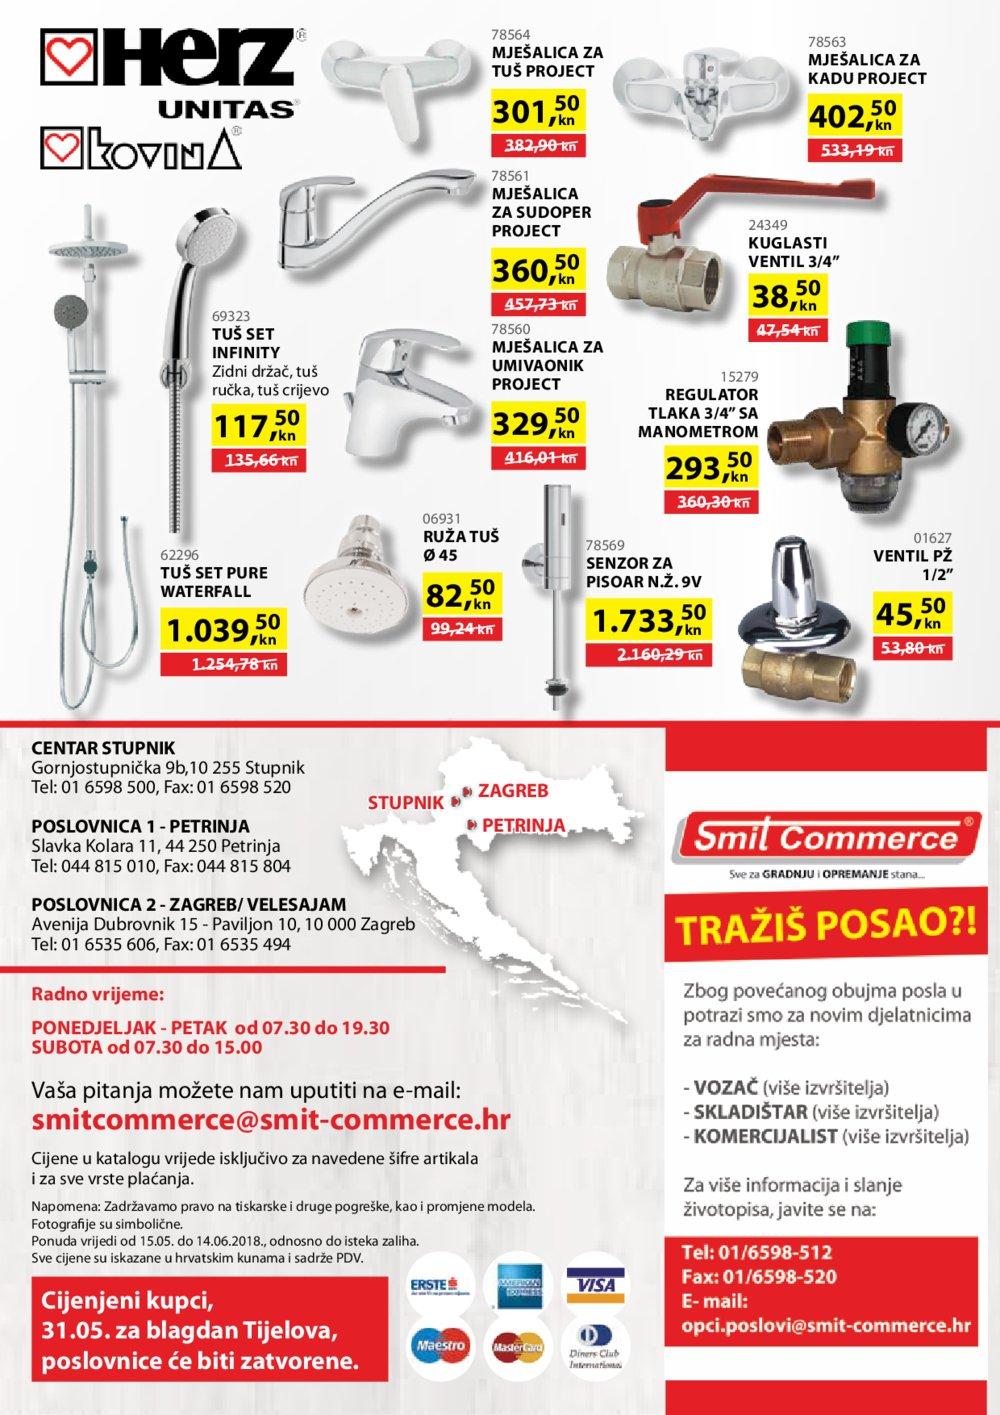 Smit Commerce katalog Akcija 15.05.-14.06.2018.